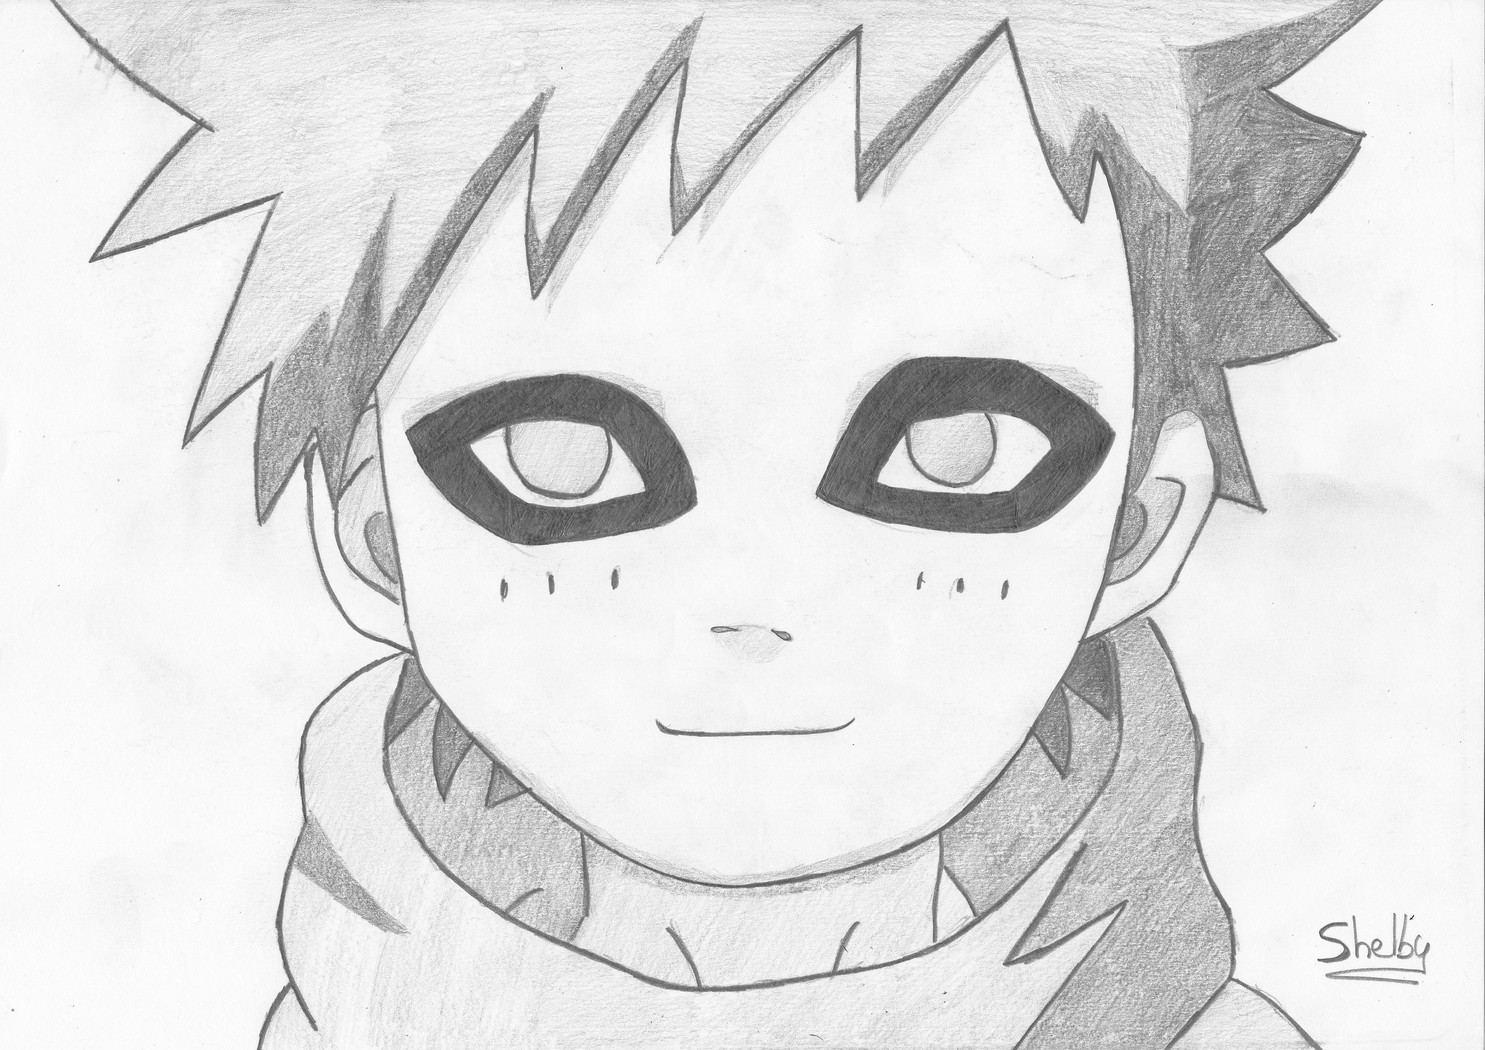 Dessin manga naruto facile dessin de manga - Dessin naruto et sasuke ...